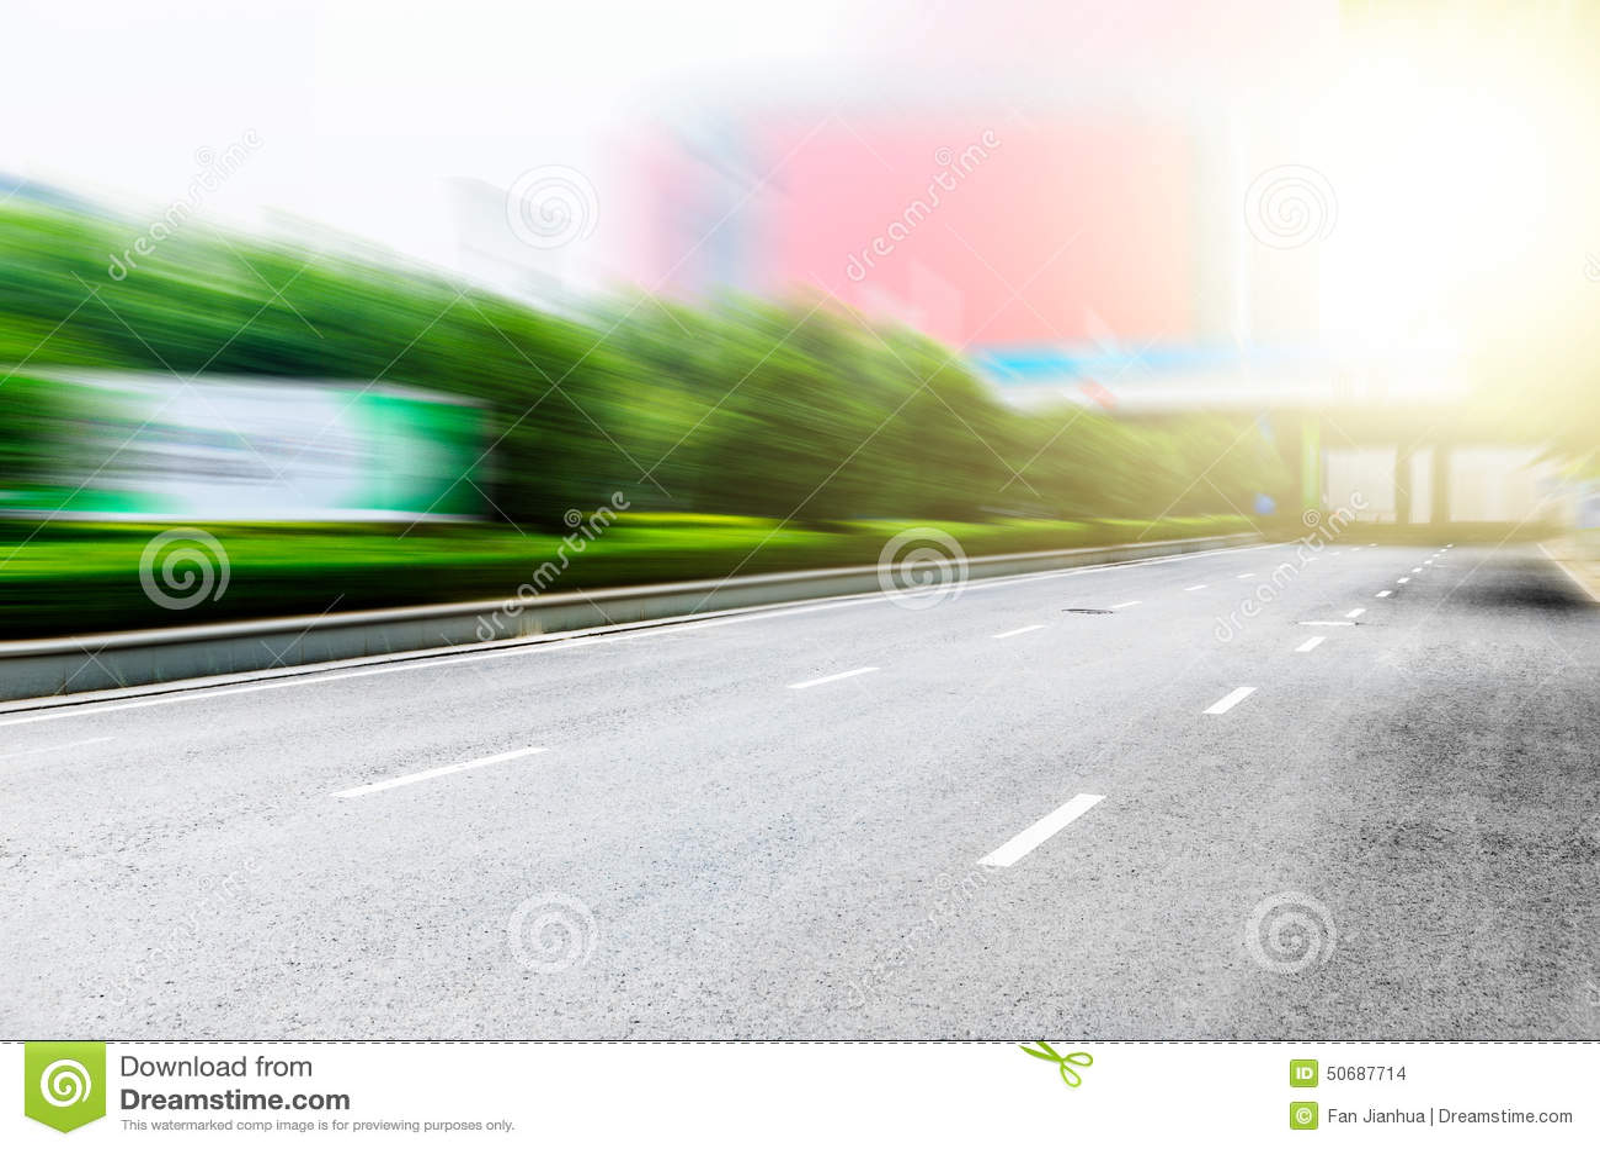 Download 现代建筑学背景和路 库存照片. 图片 包括有 发展, 转接, 现代, 繁忙, 堵塞, 迅速, 业务量, 高速公路 - 50687714